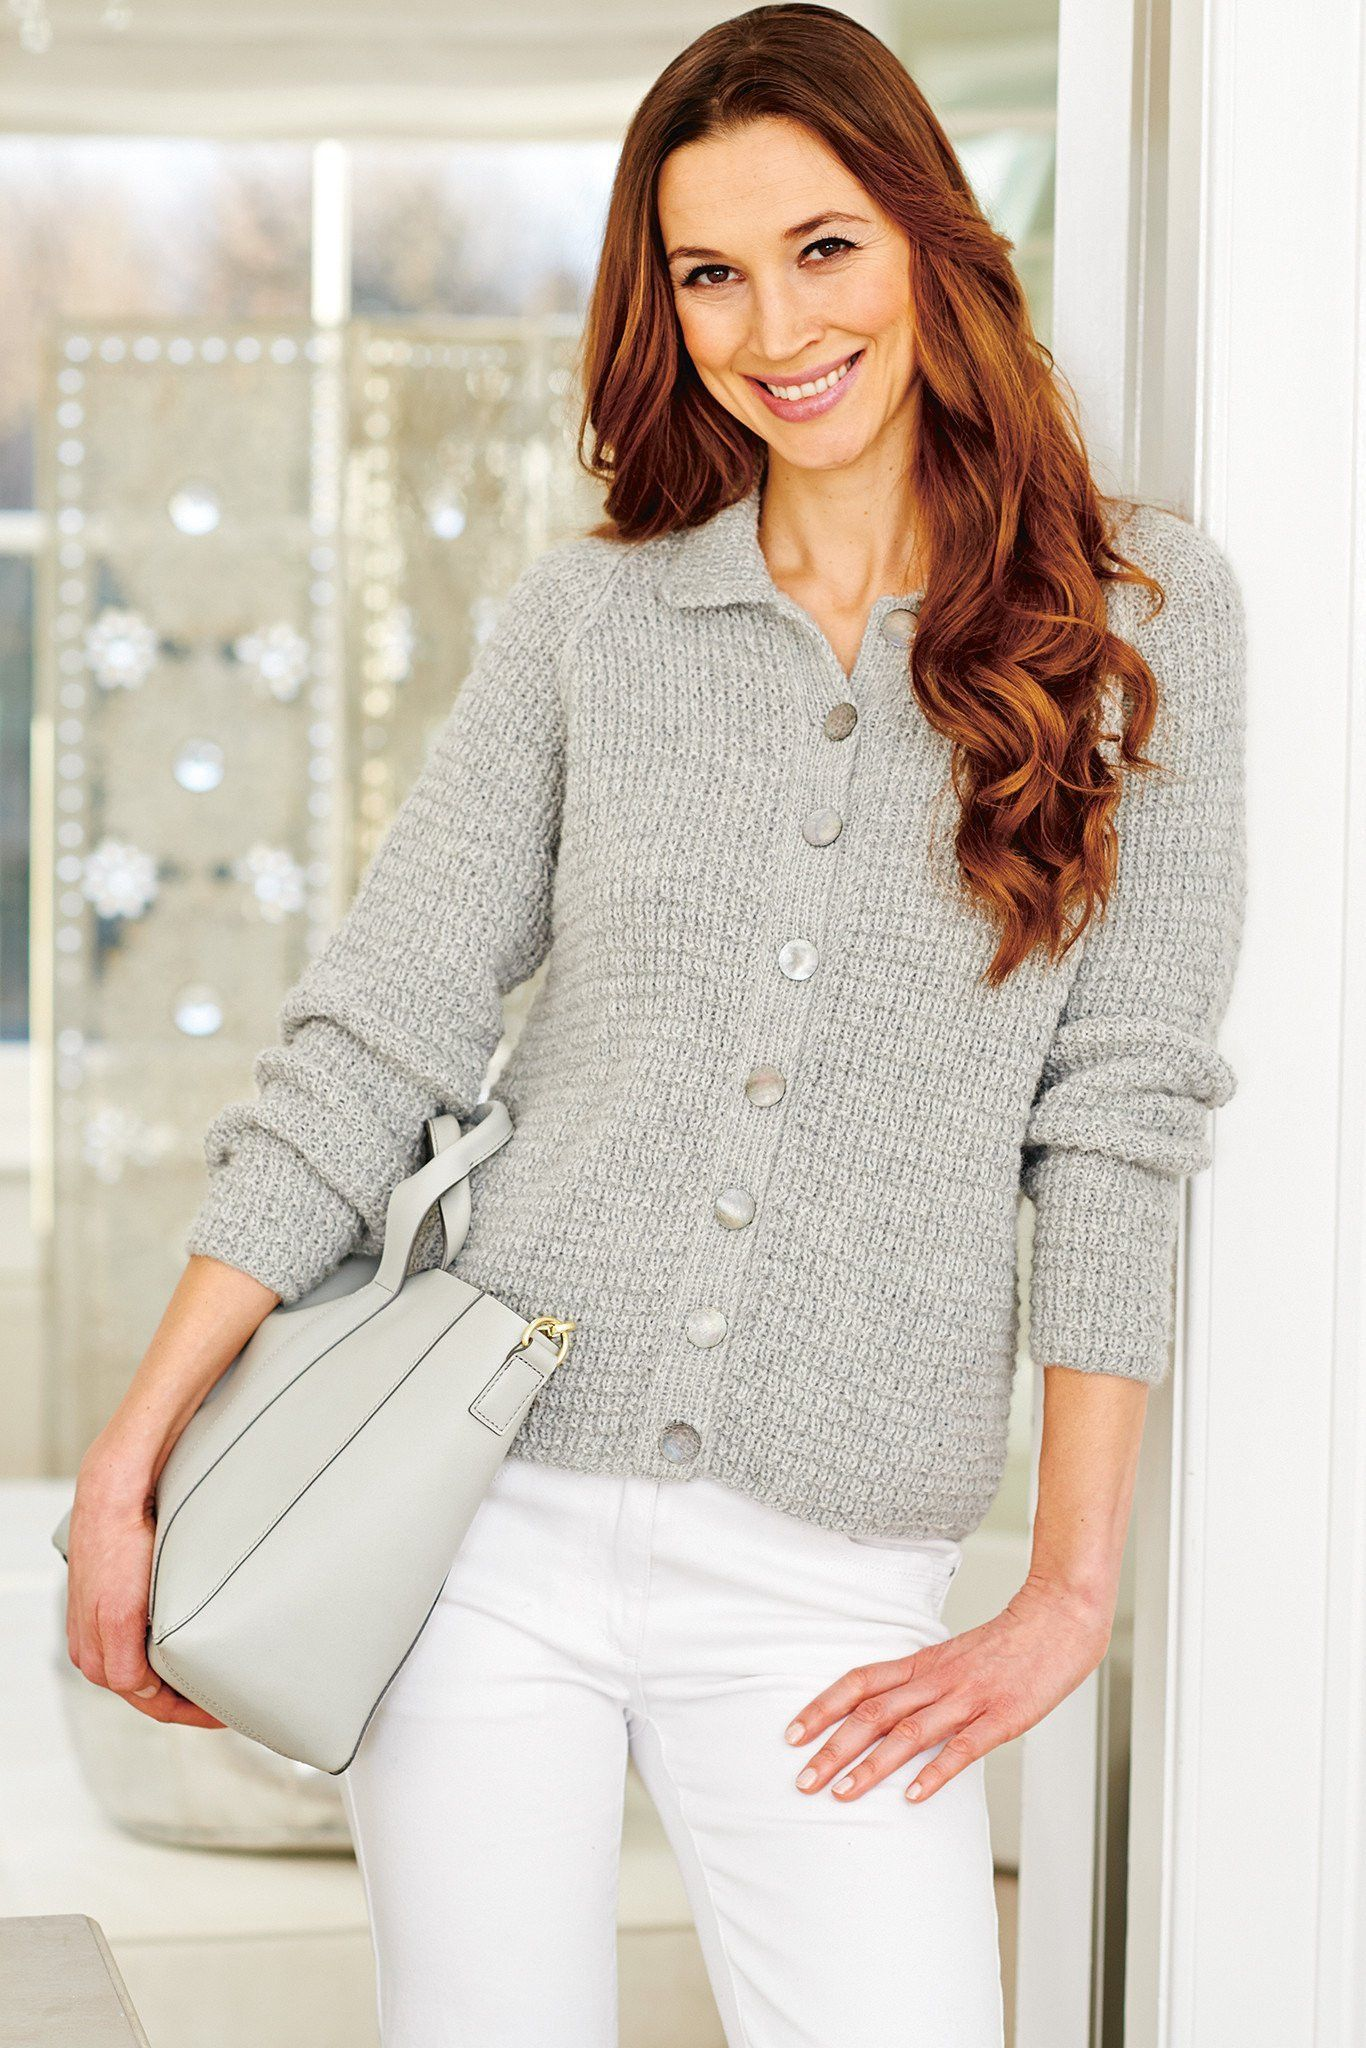 Vintage Long Sleeve Ladies Cardigan Knitting Pattern | The ...